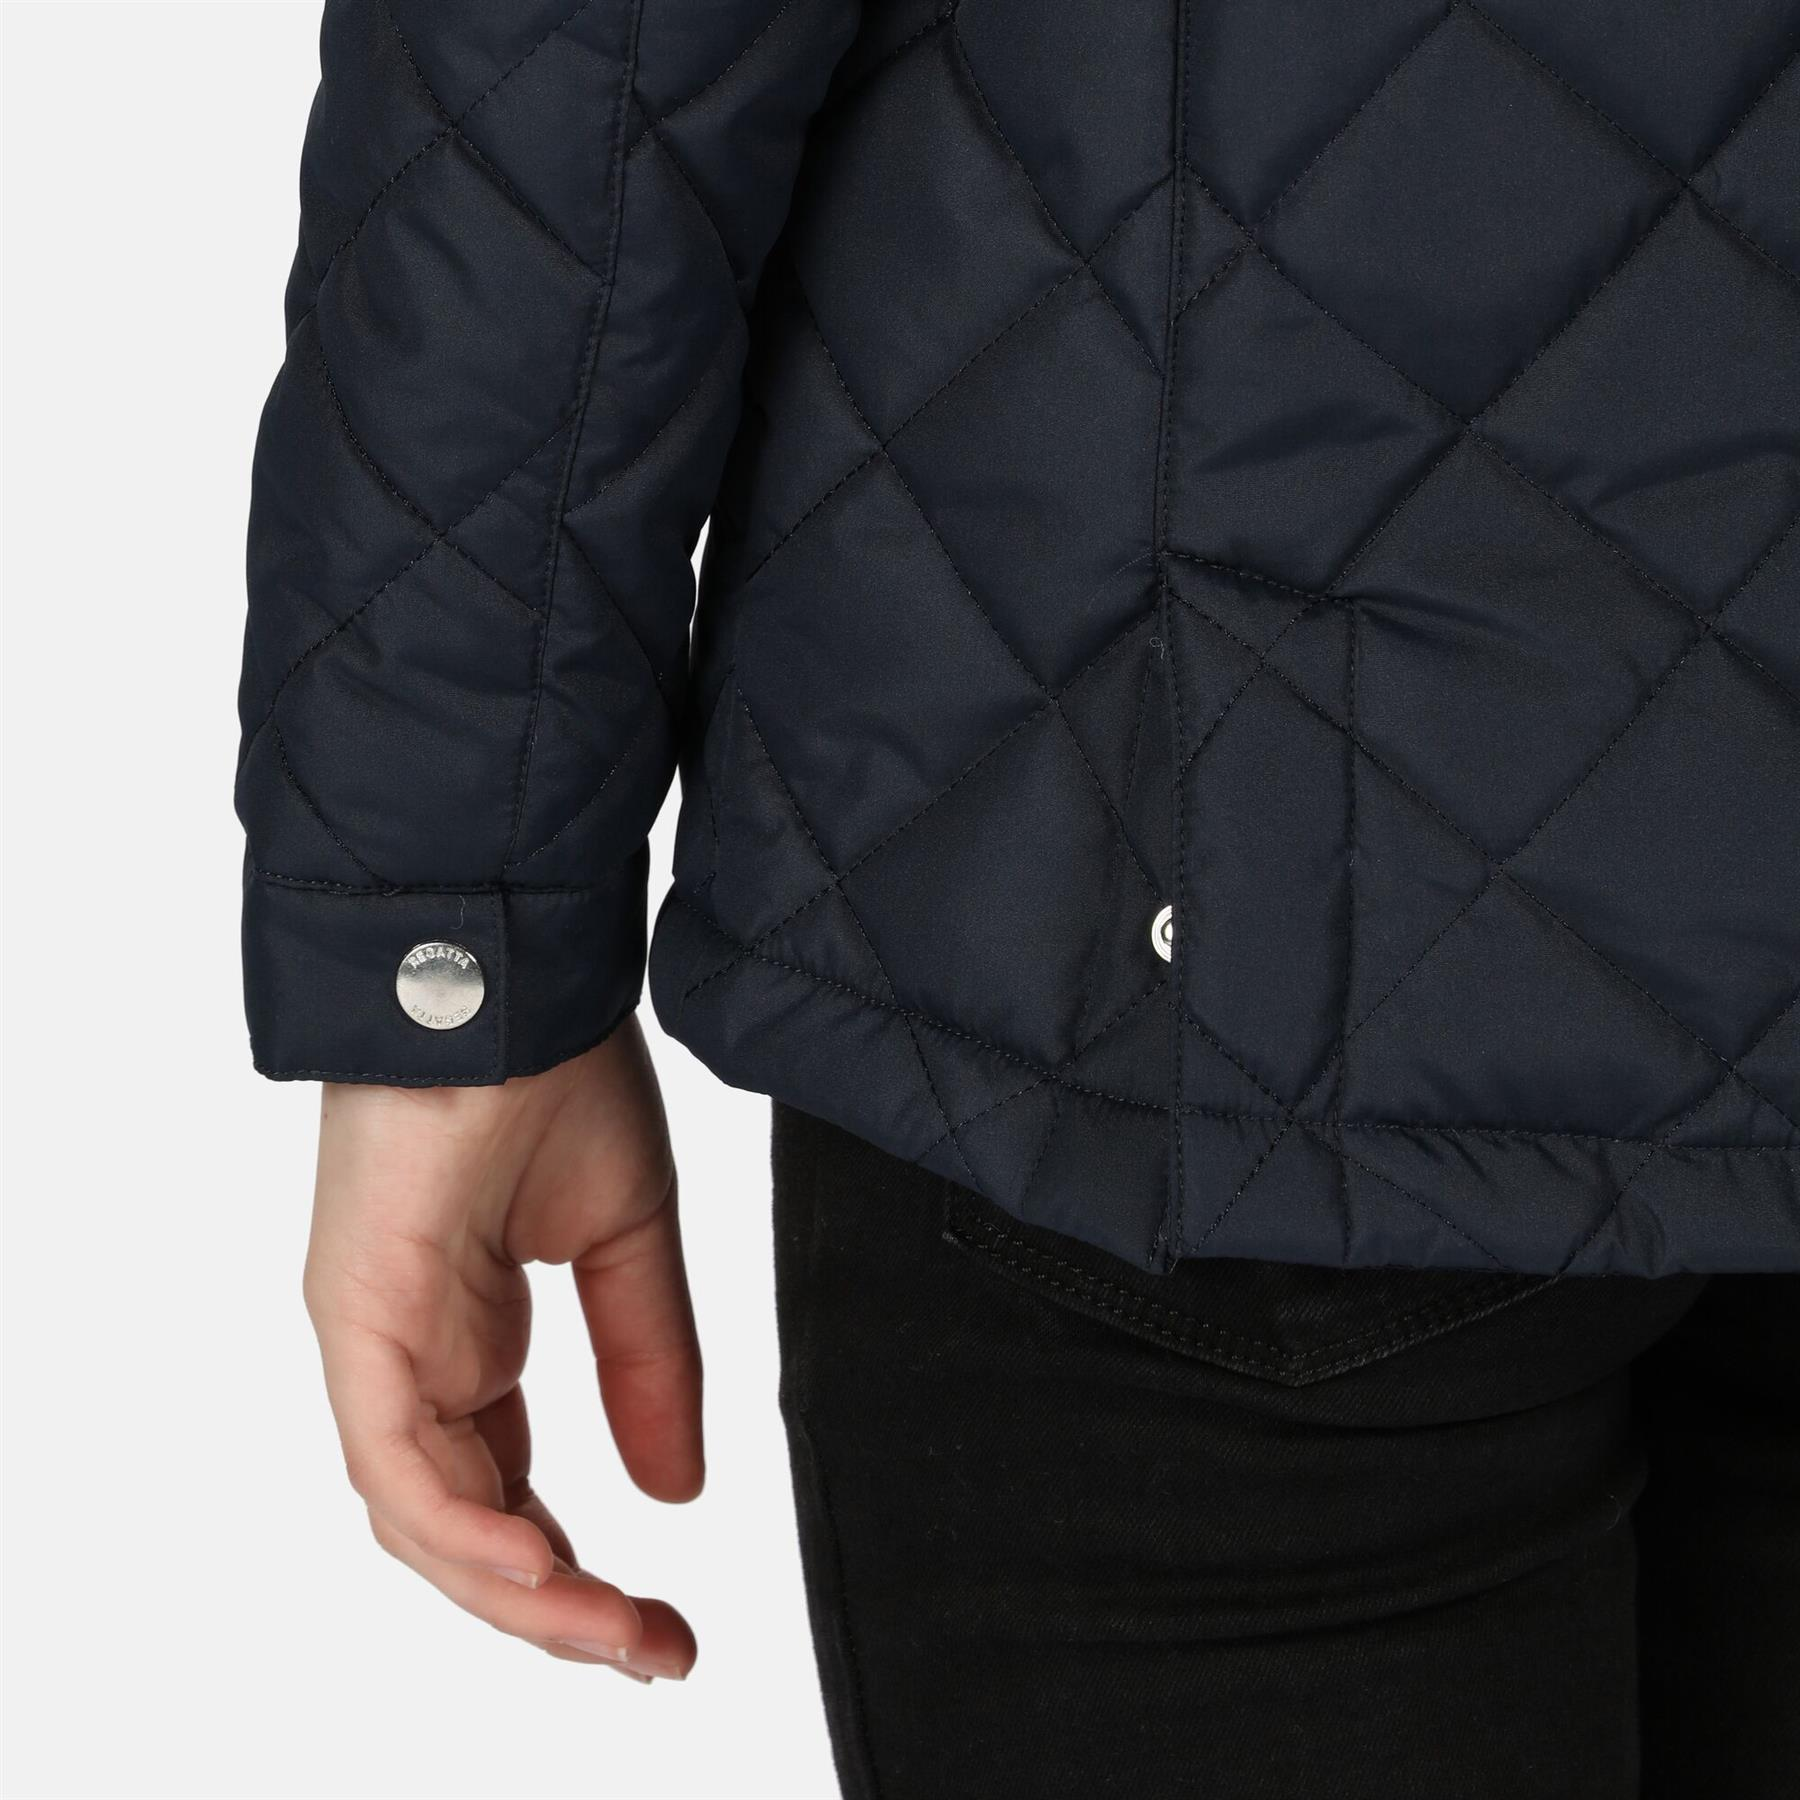 miniatuur 7 - Regatta Kids Zalenka Quilted Insulated Zipped Pocket Jacket Boys Girls